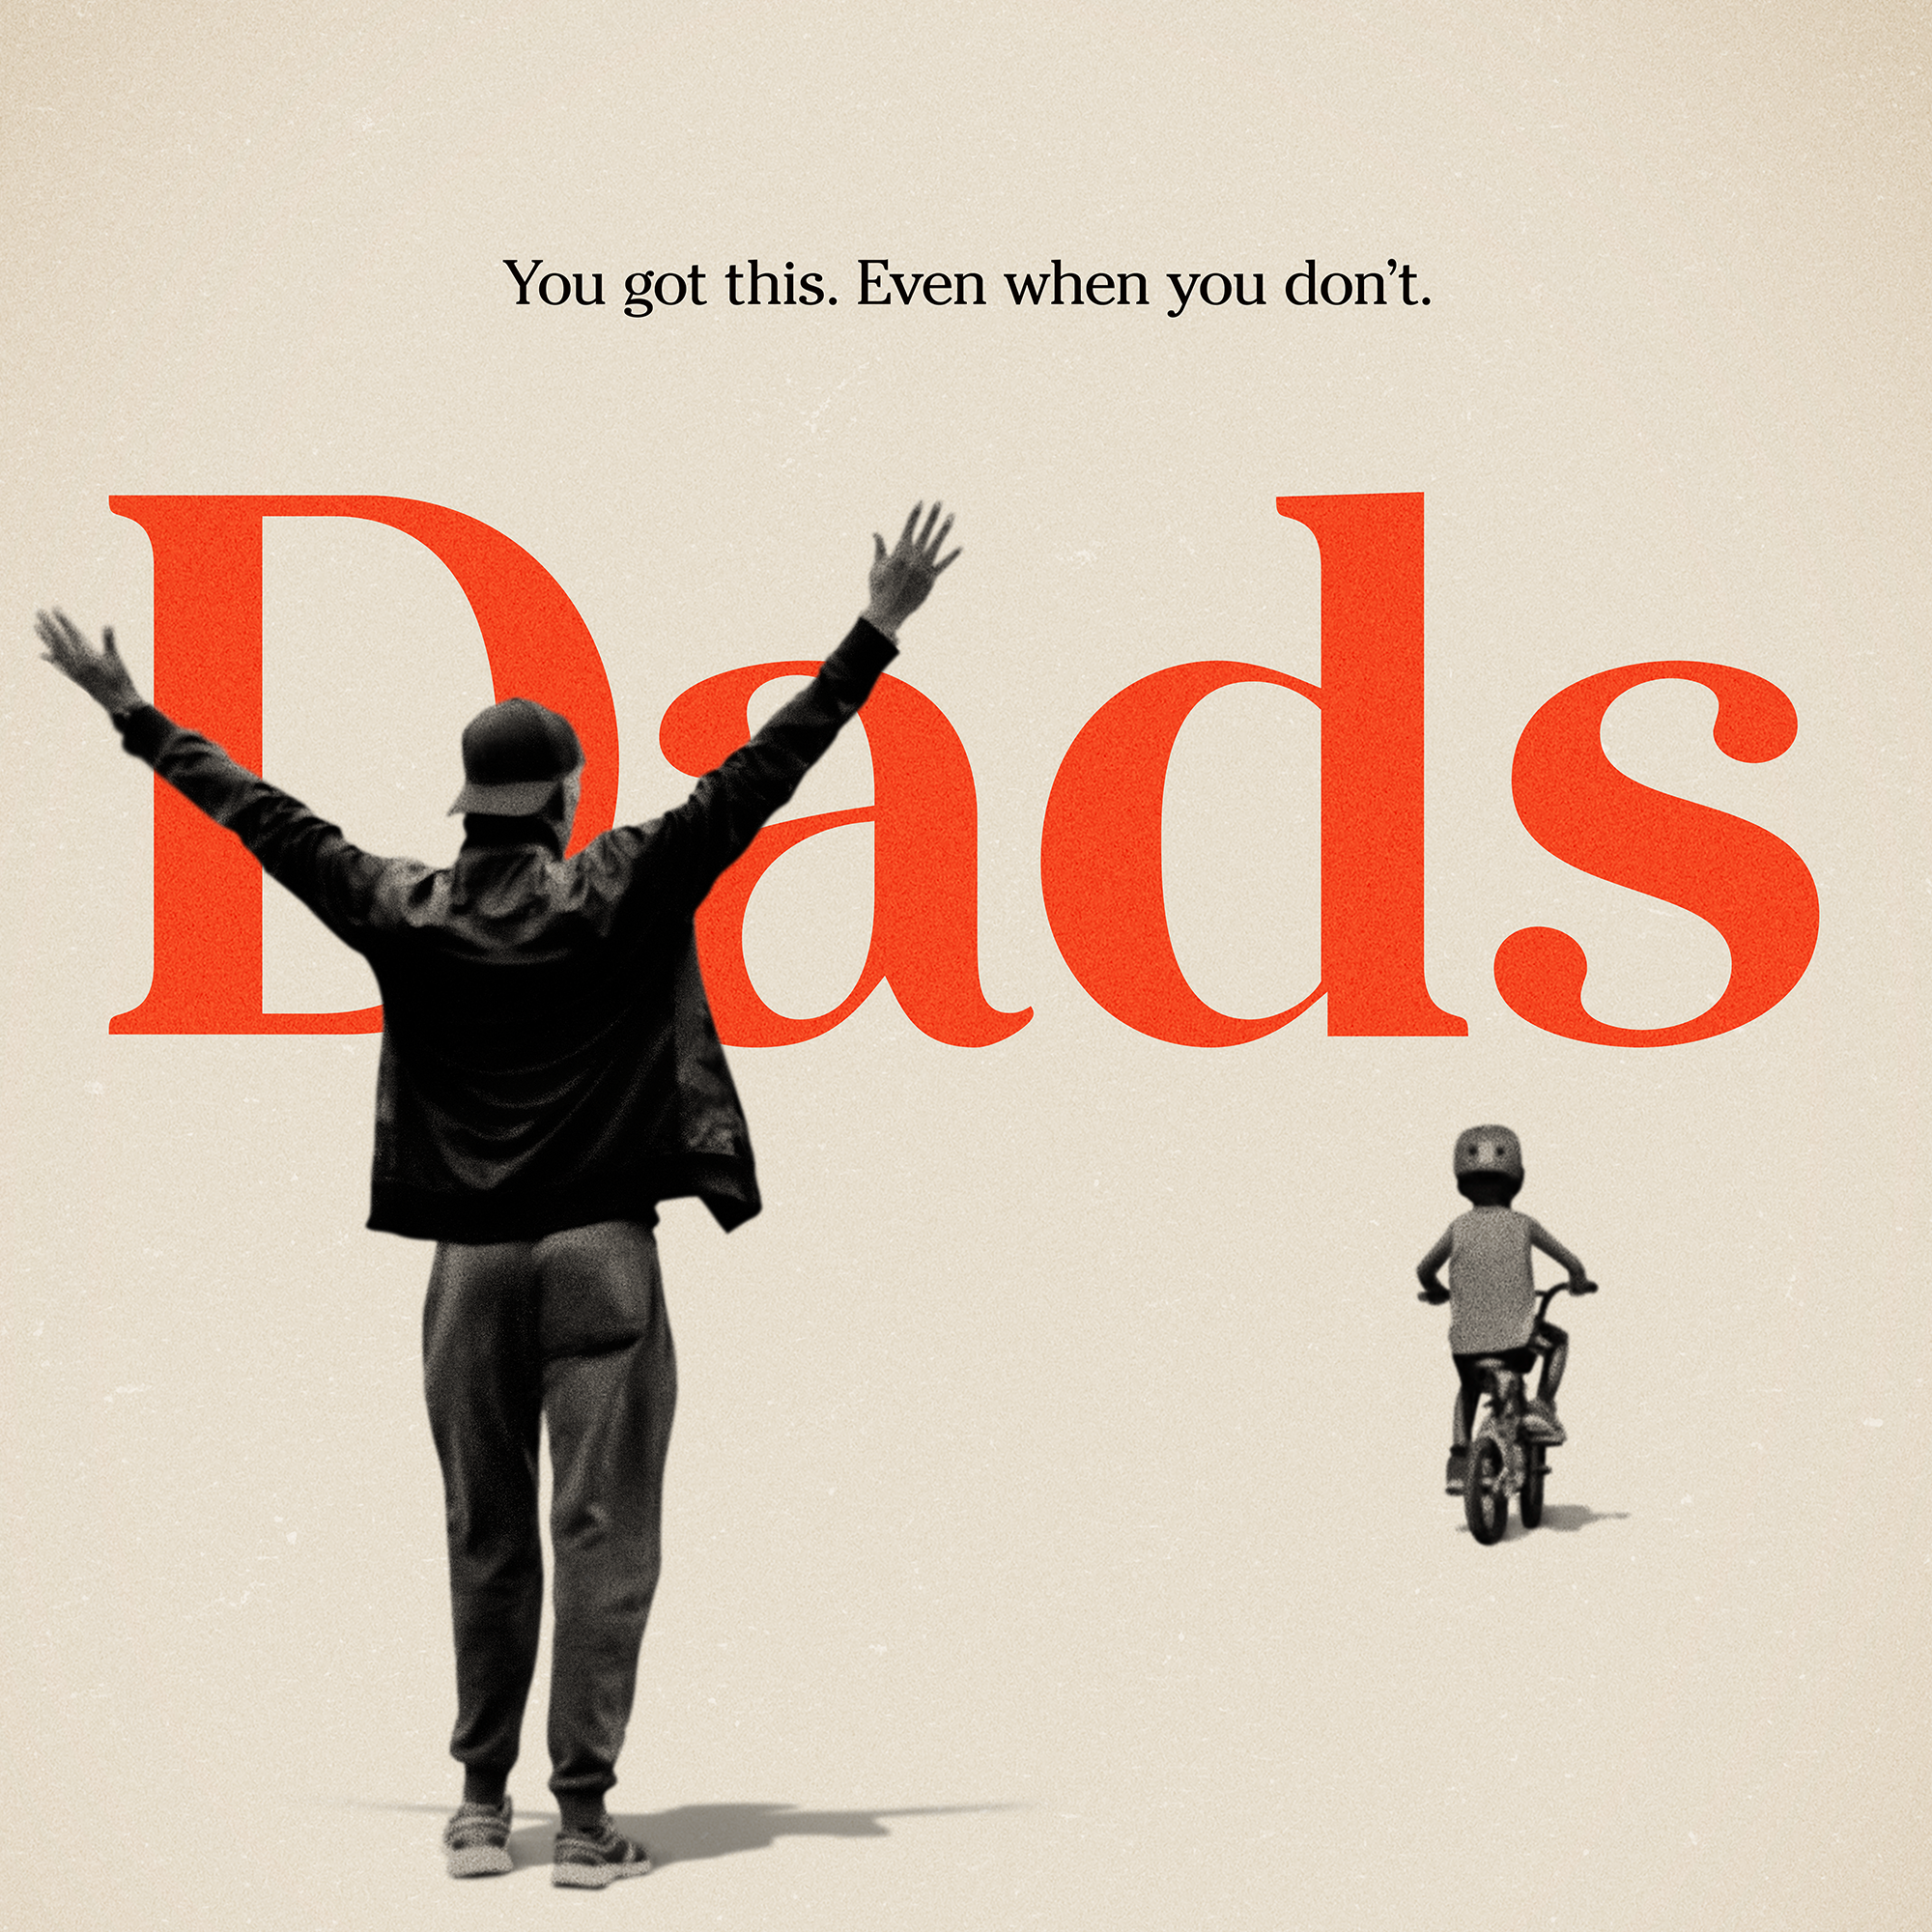 Dads documentary